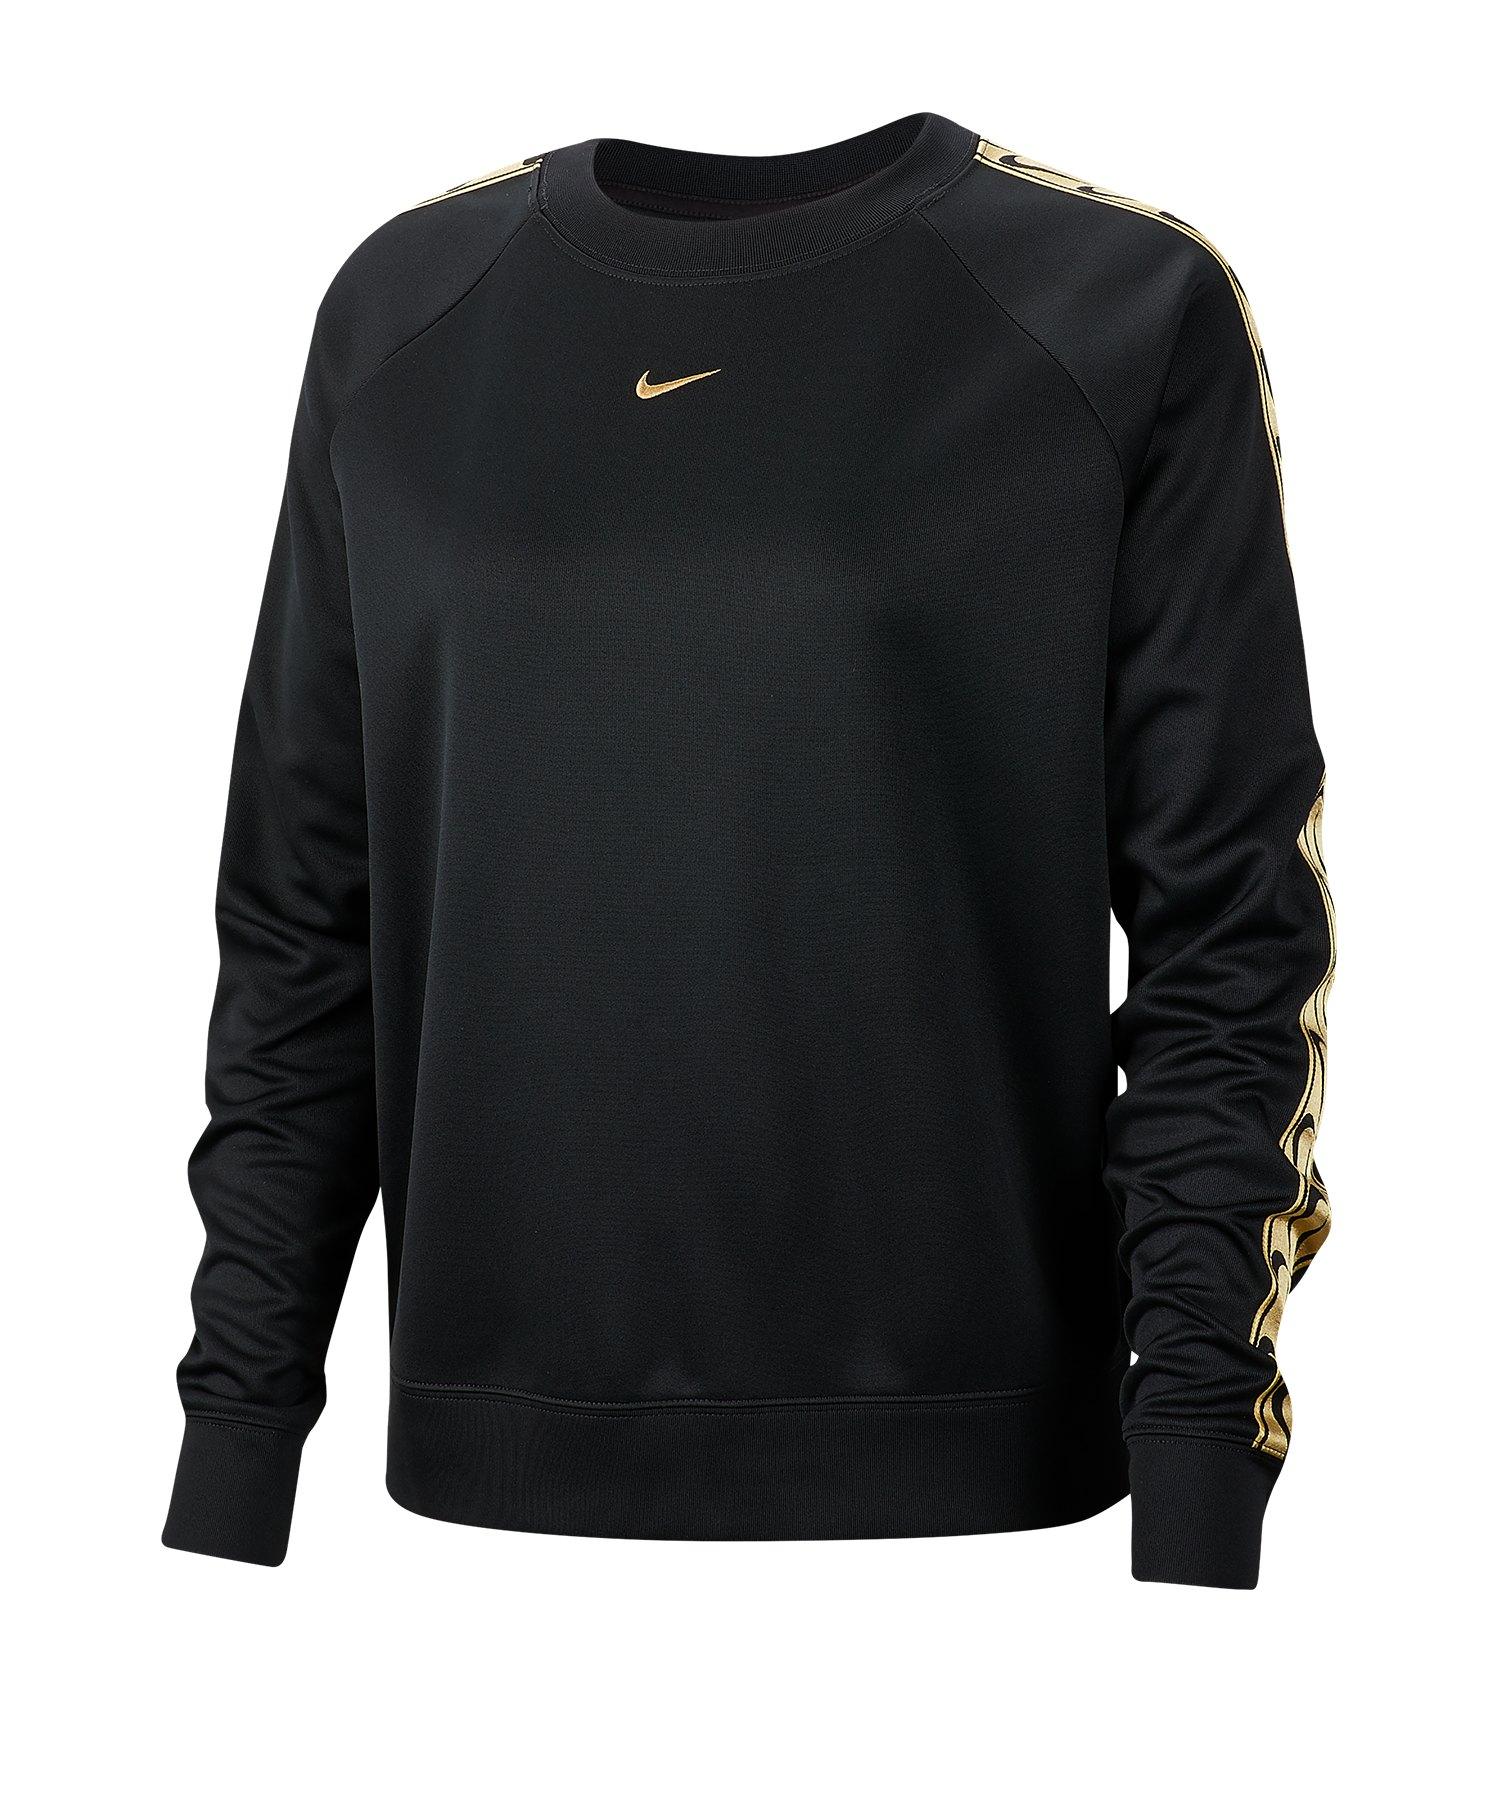 Nike Trainingsshirt langarm Damen Schwarz F011 - schwarz